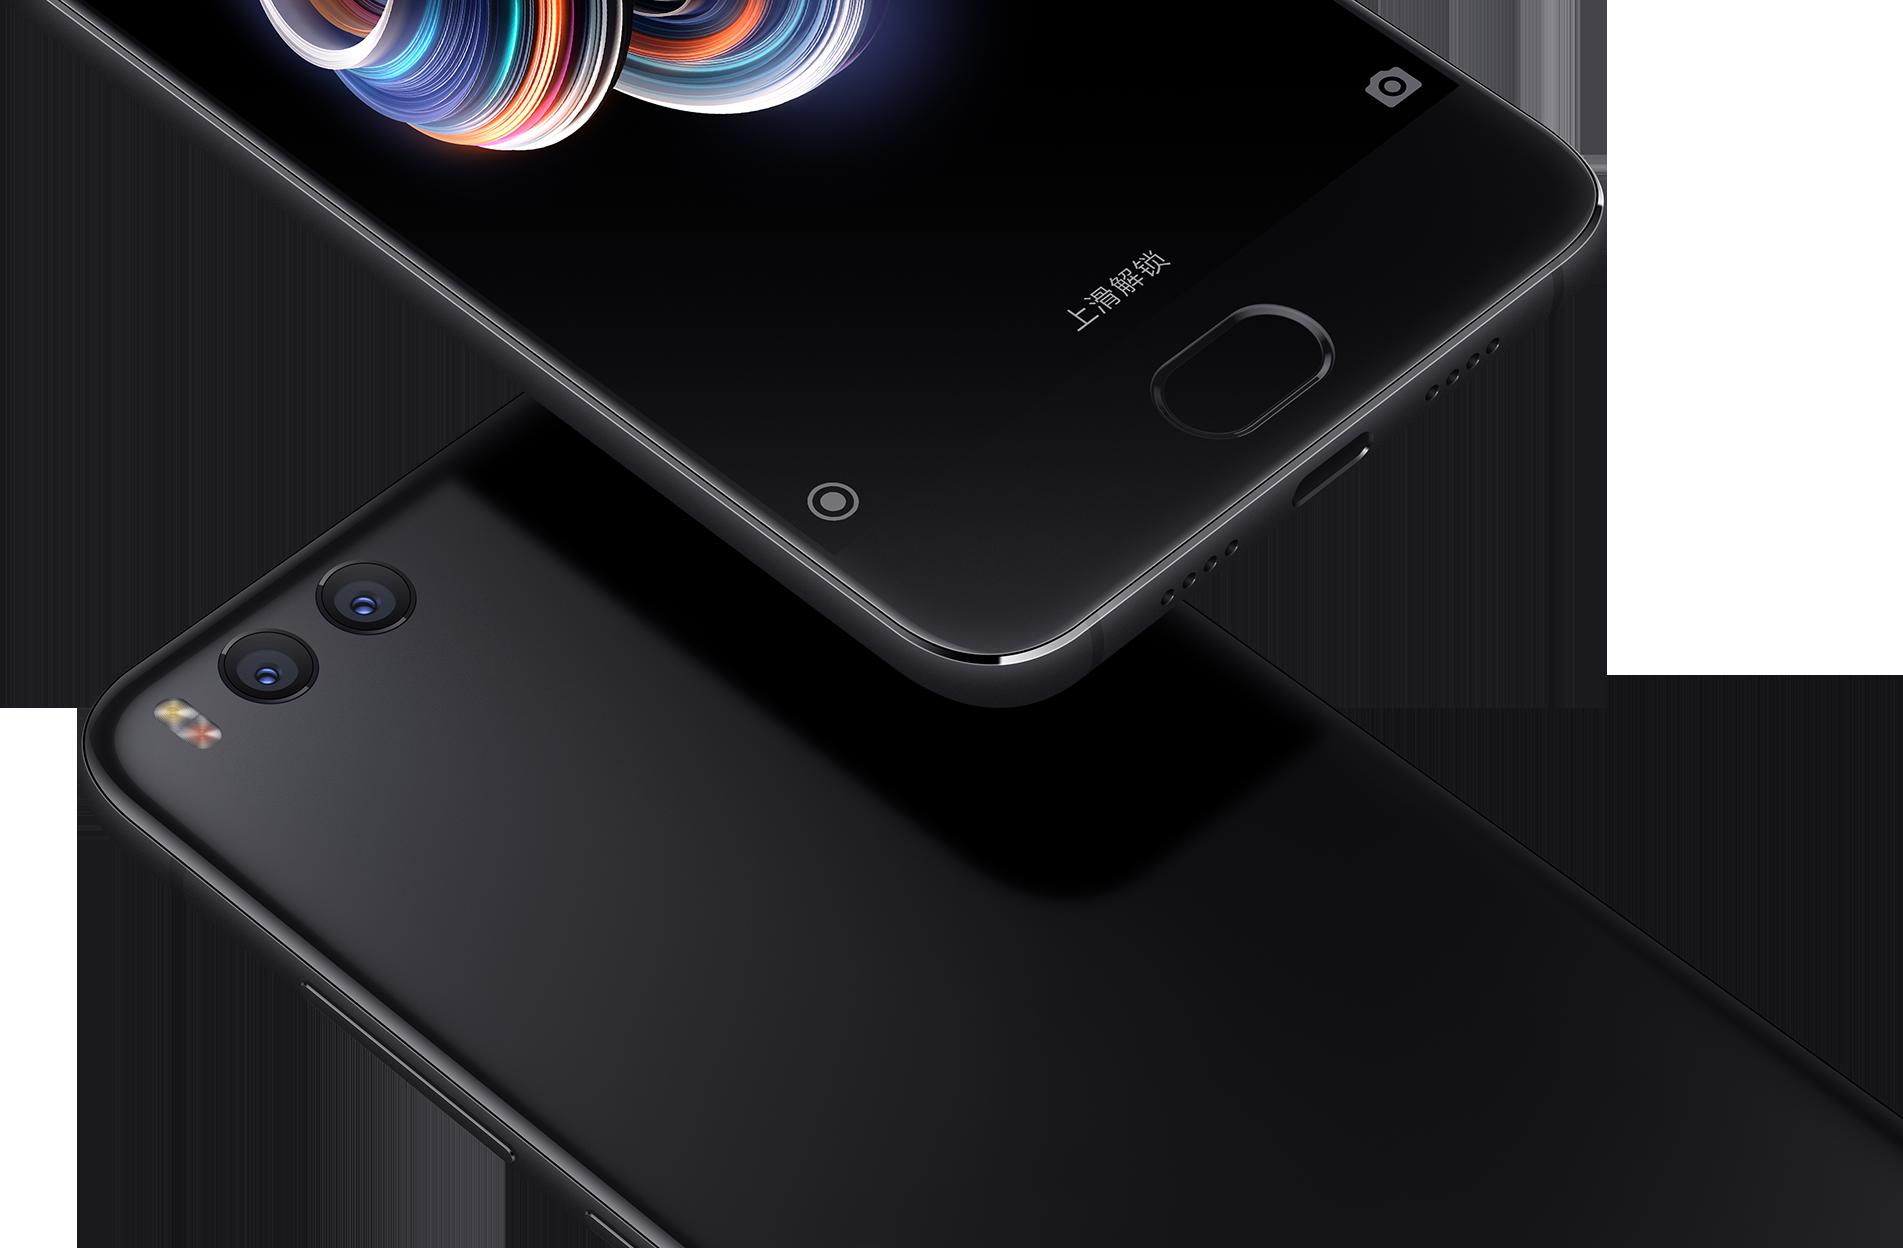 Xiaomi Mi Note 3 - wygląd telefonu